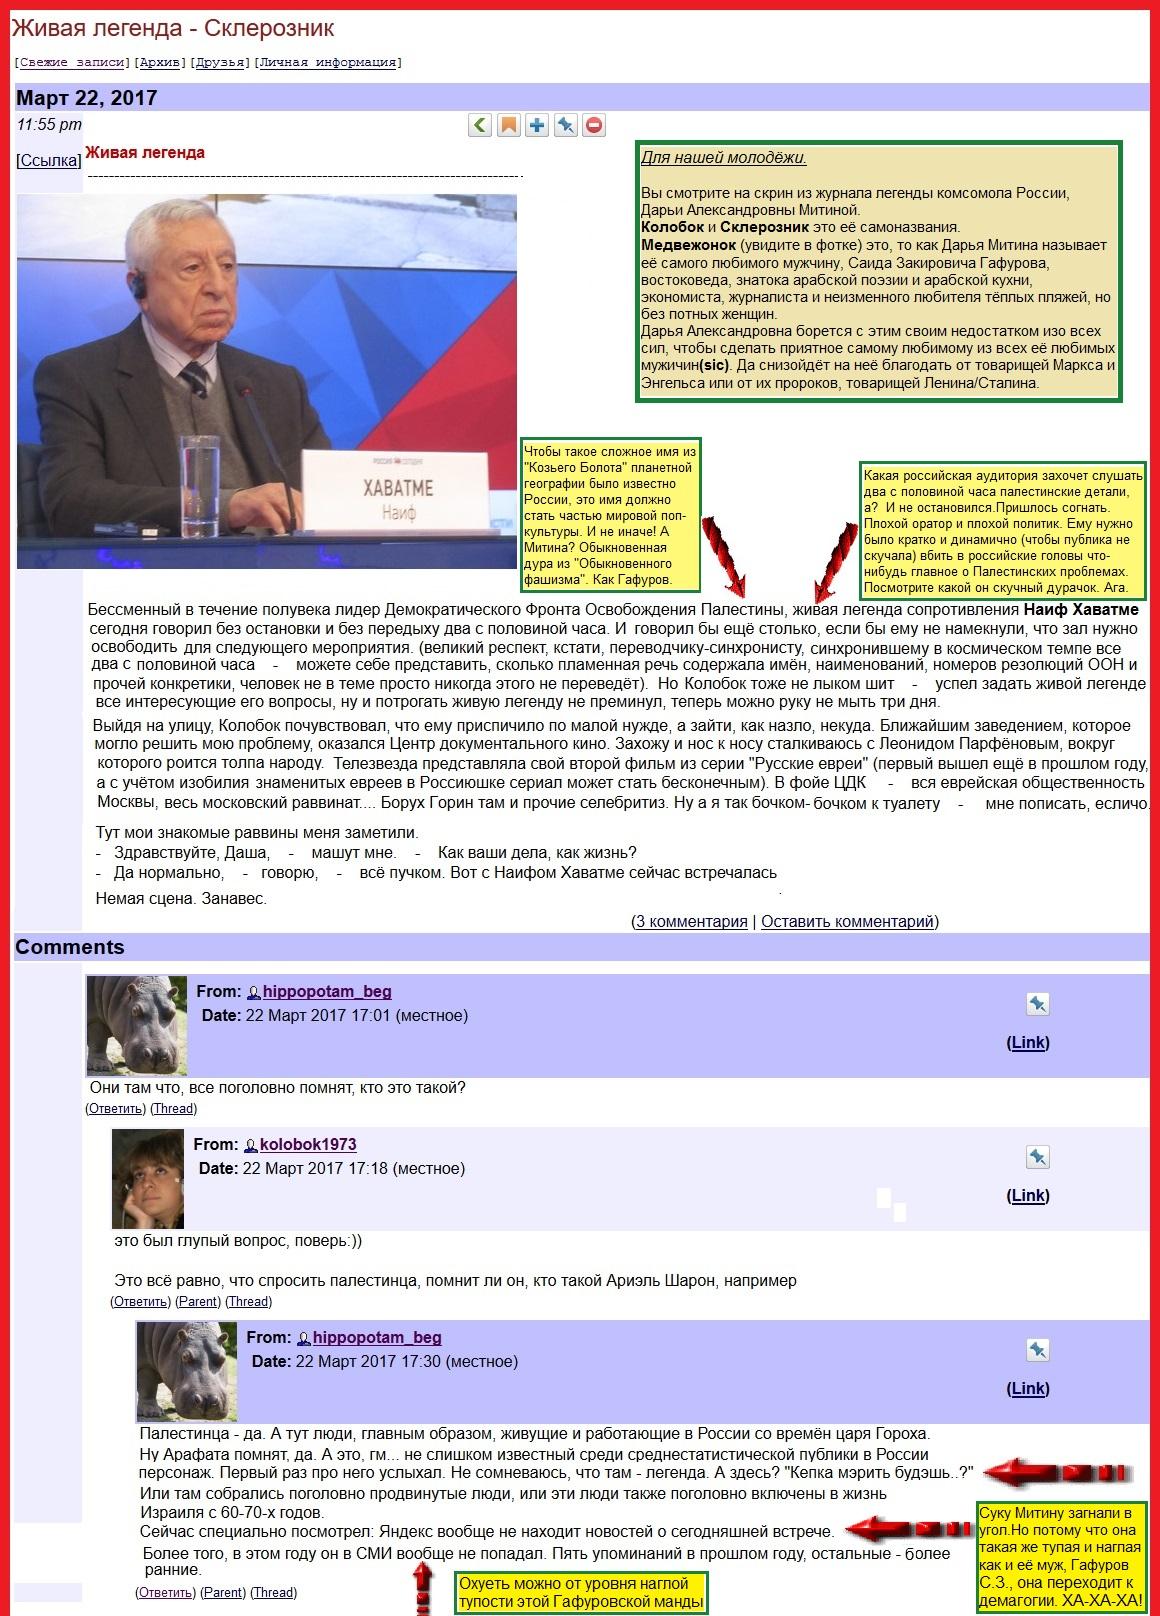 Митина лжёт. О палестинском малоизвестном в России лидере Хаиф Хаватма(1)